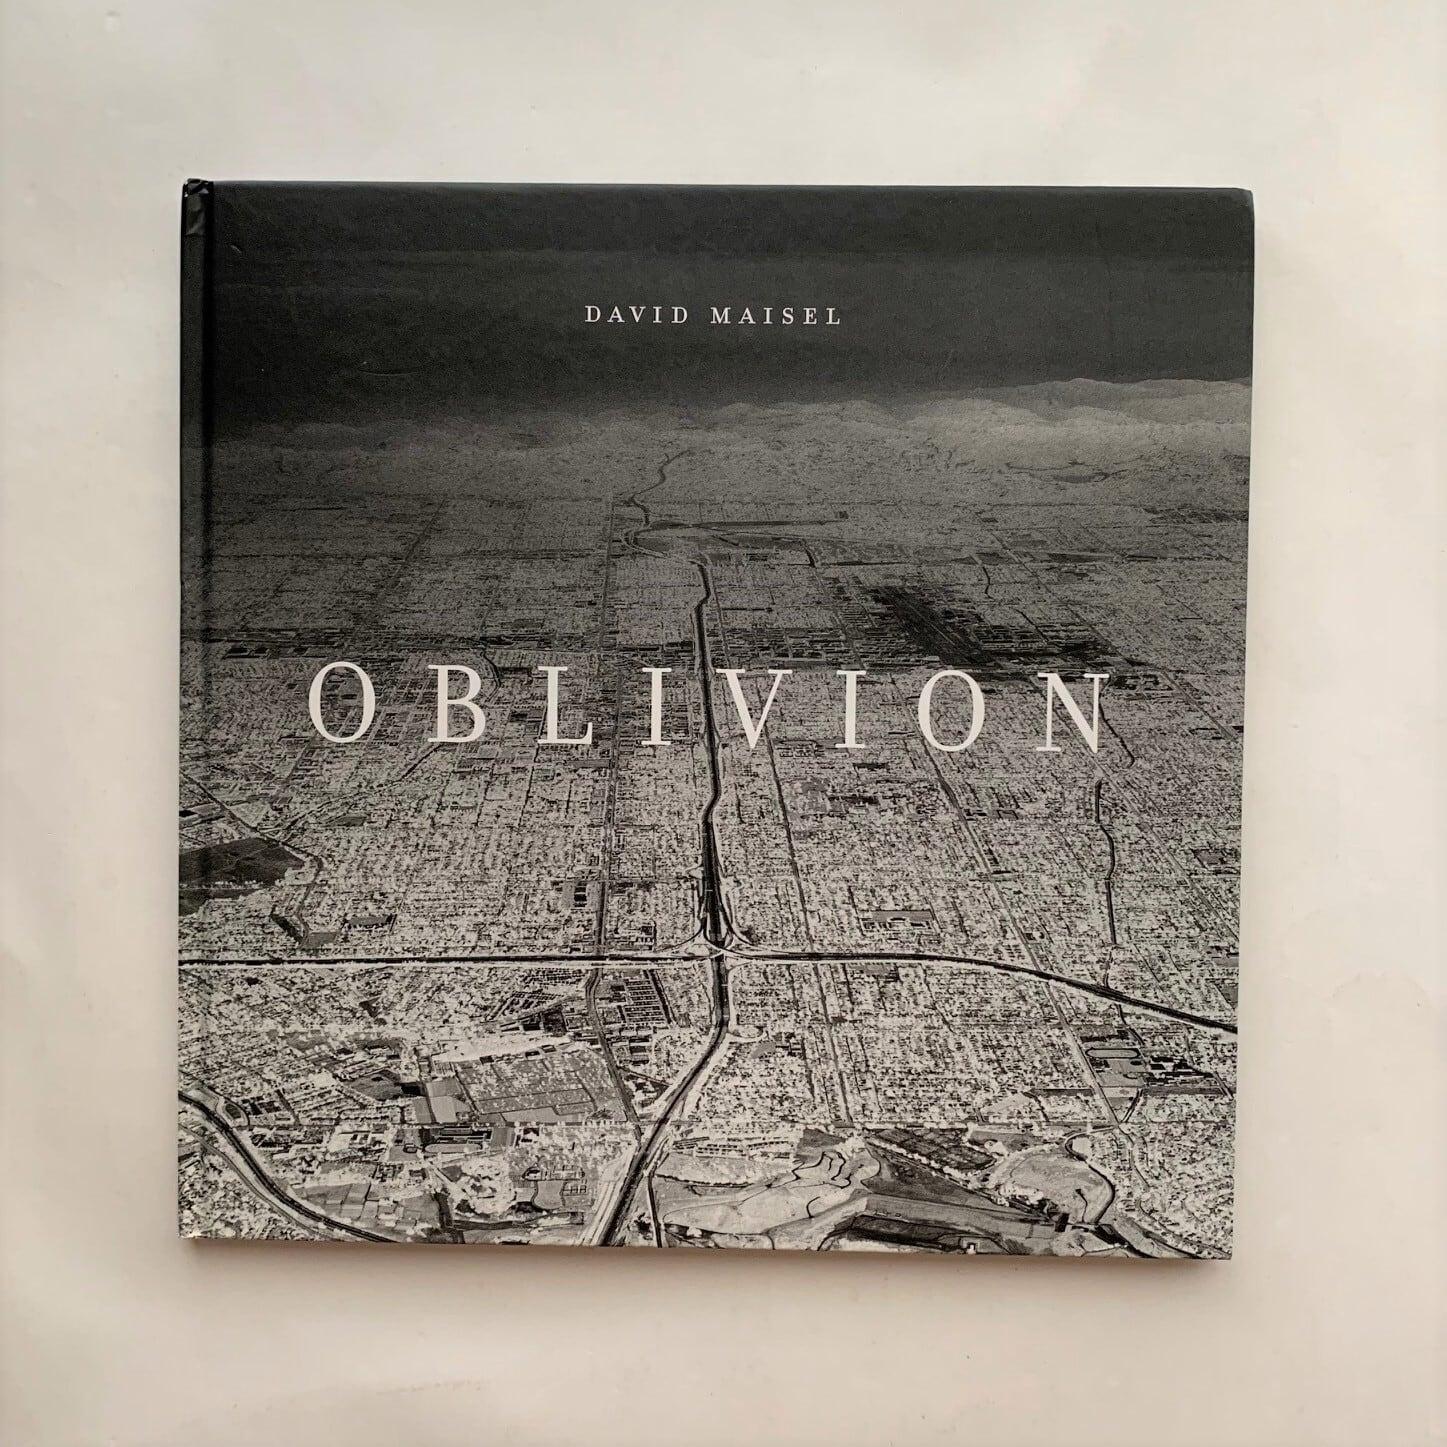 Oblivion / David Maisel